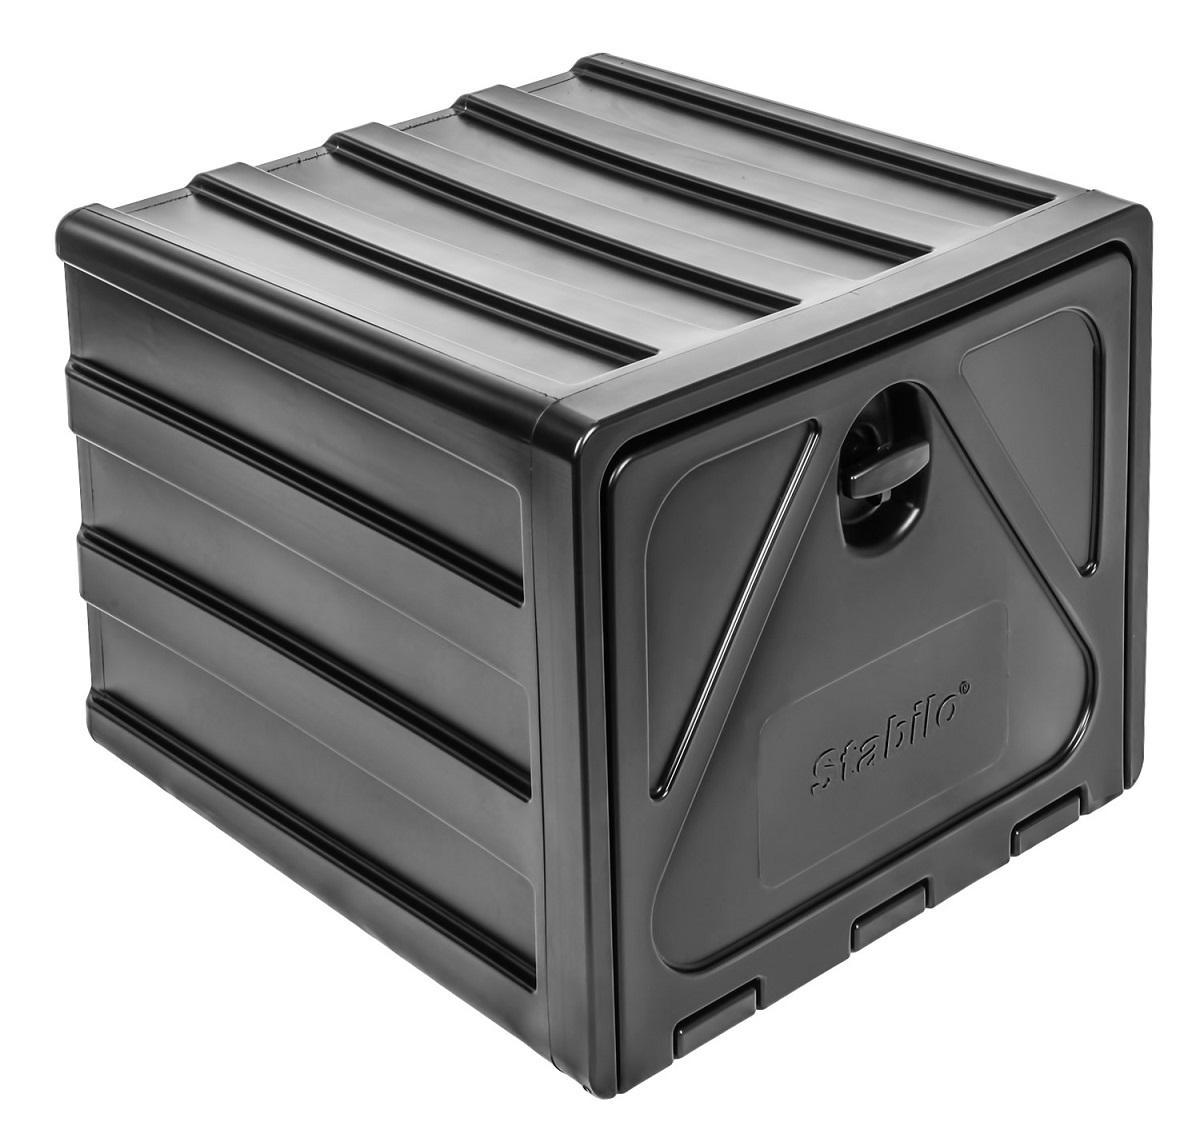 Stabilo 174 Box 600 2 Van Truck Trailer Toolbox 600x500x650